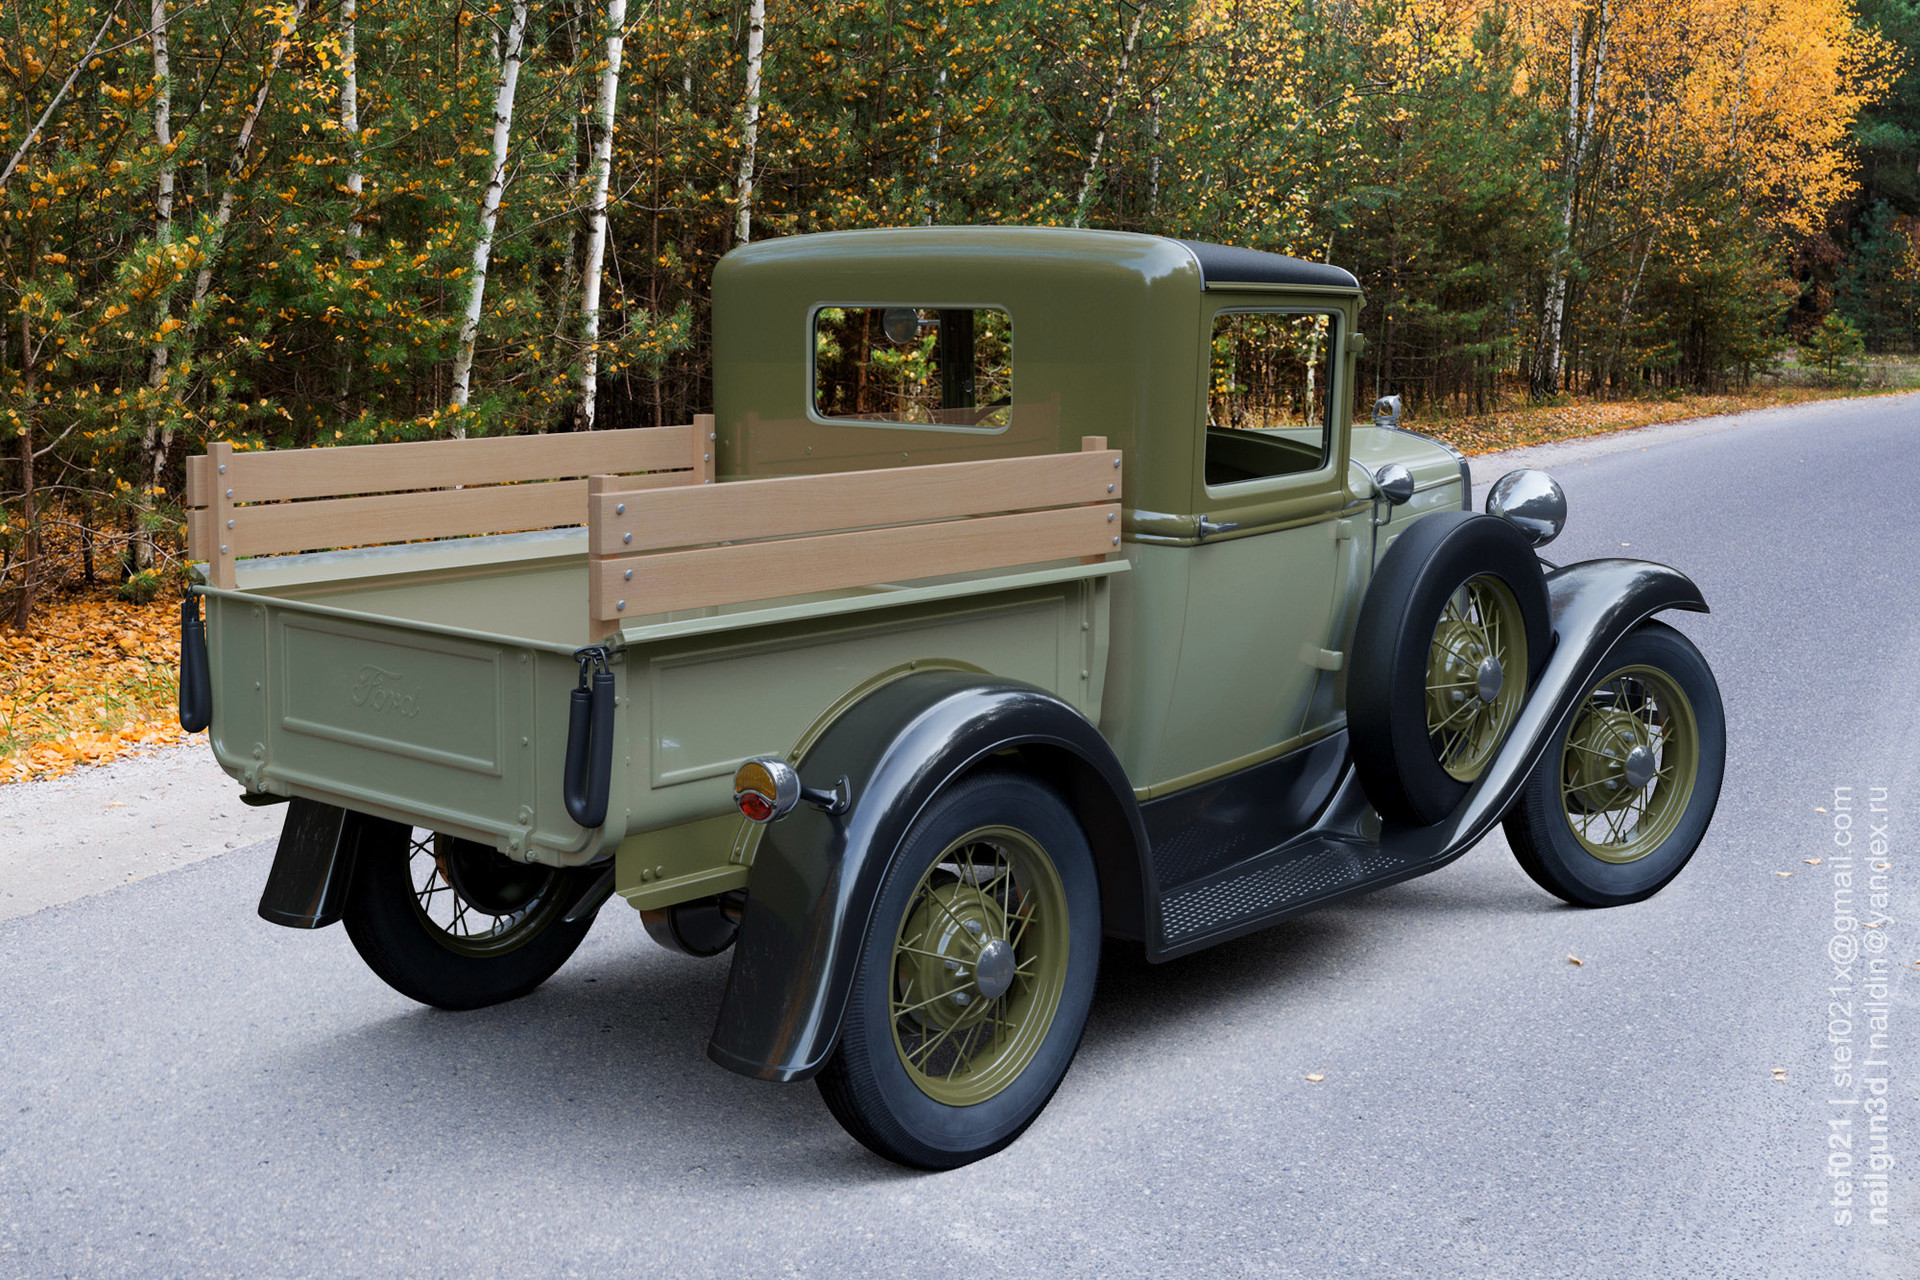 Nail khusnutdinov a0007 ford a pickup 1931 render green 2